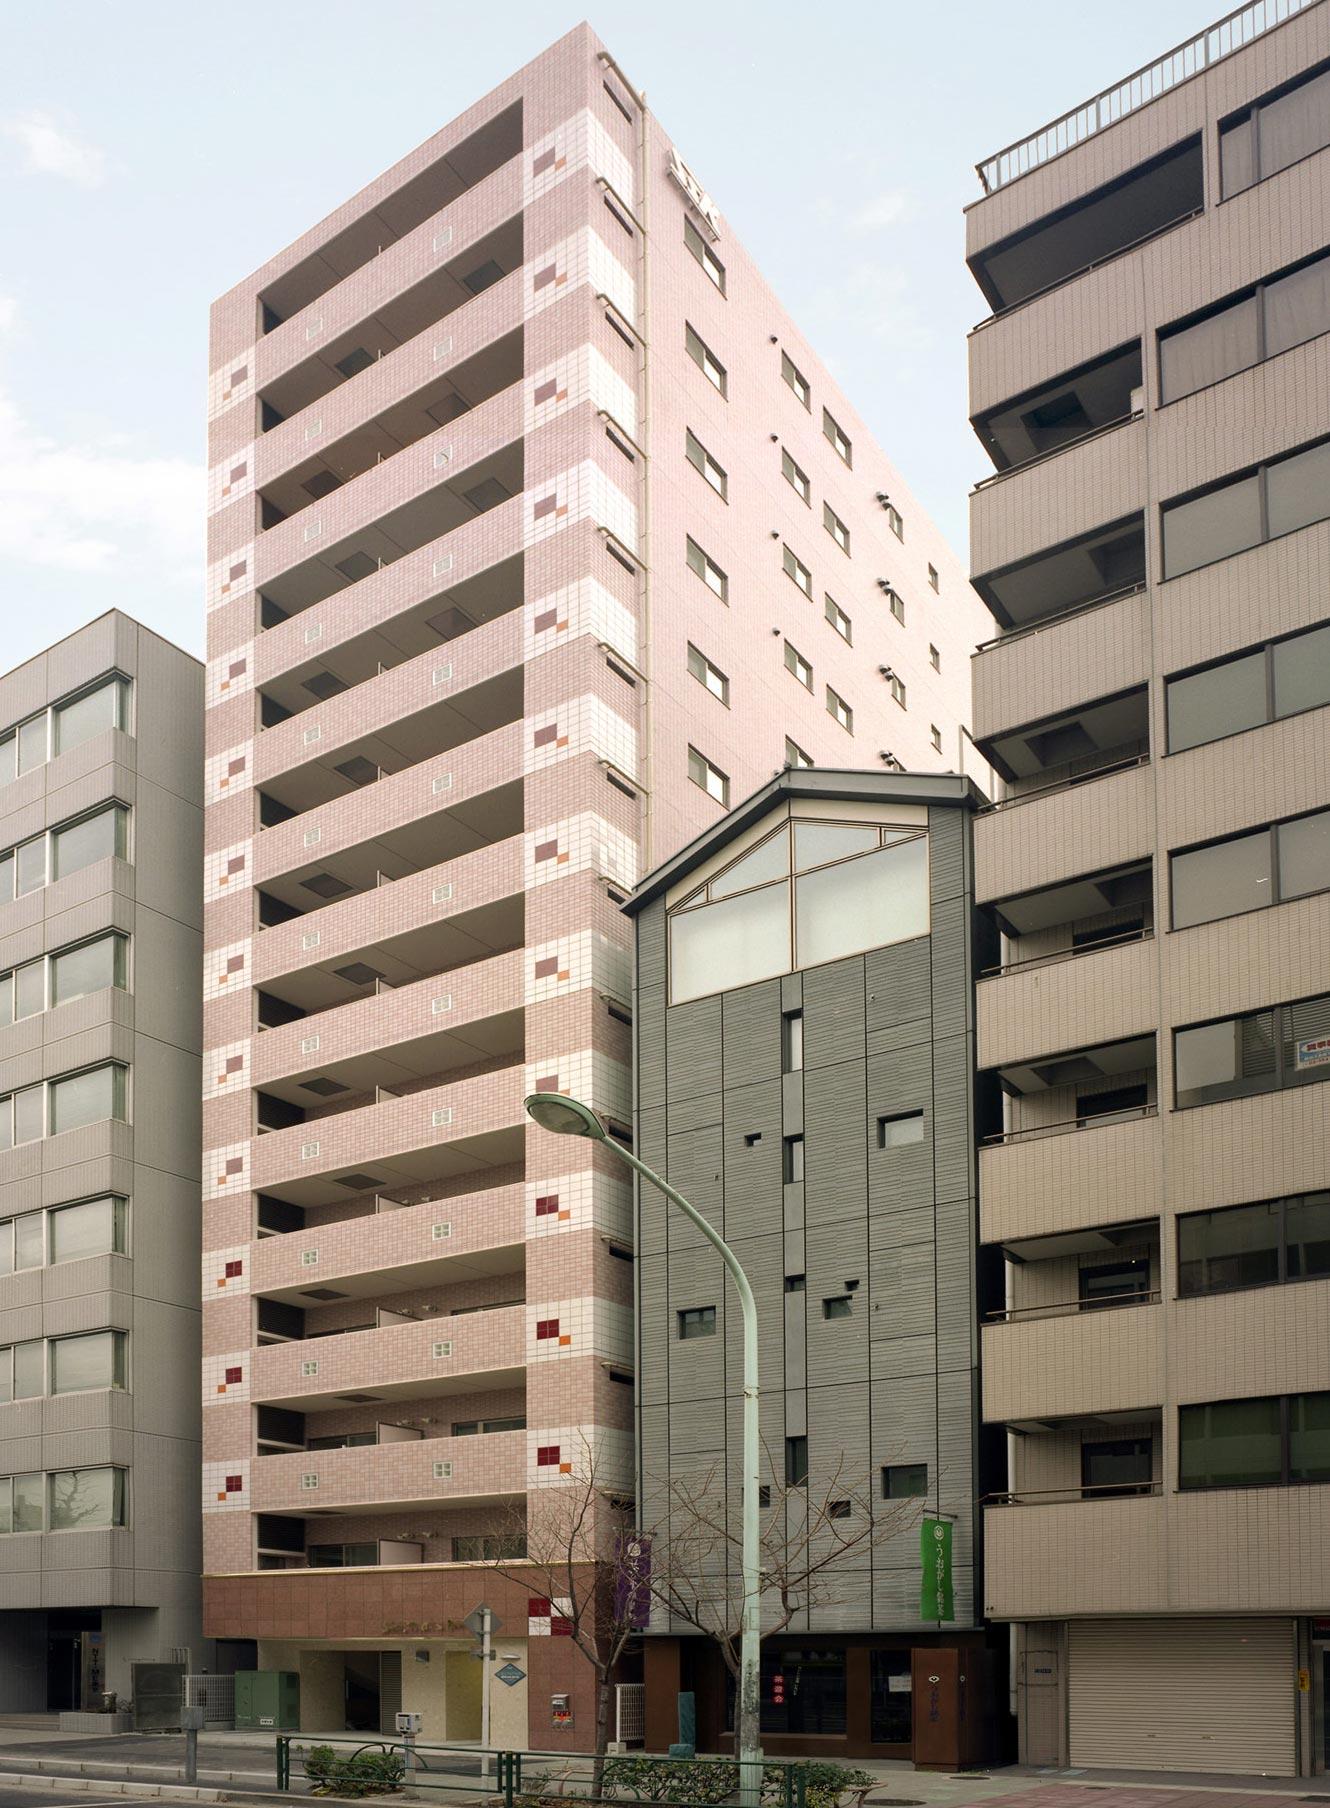 GREEN PARK 銀座デ・プレ | マンションギャラリー